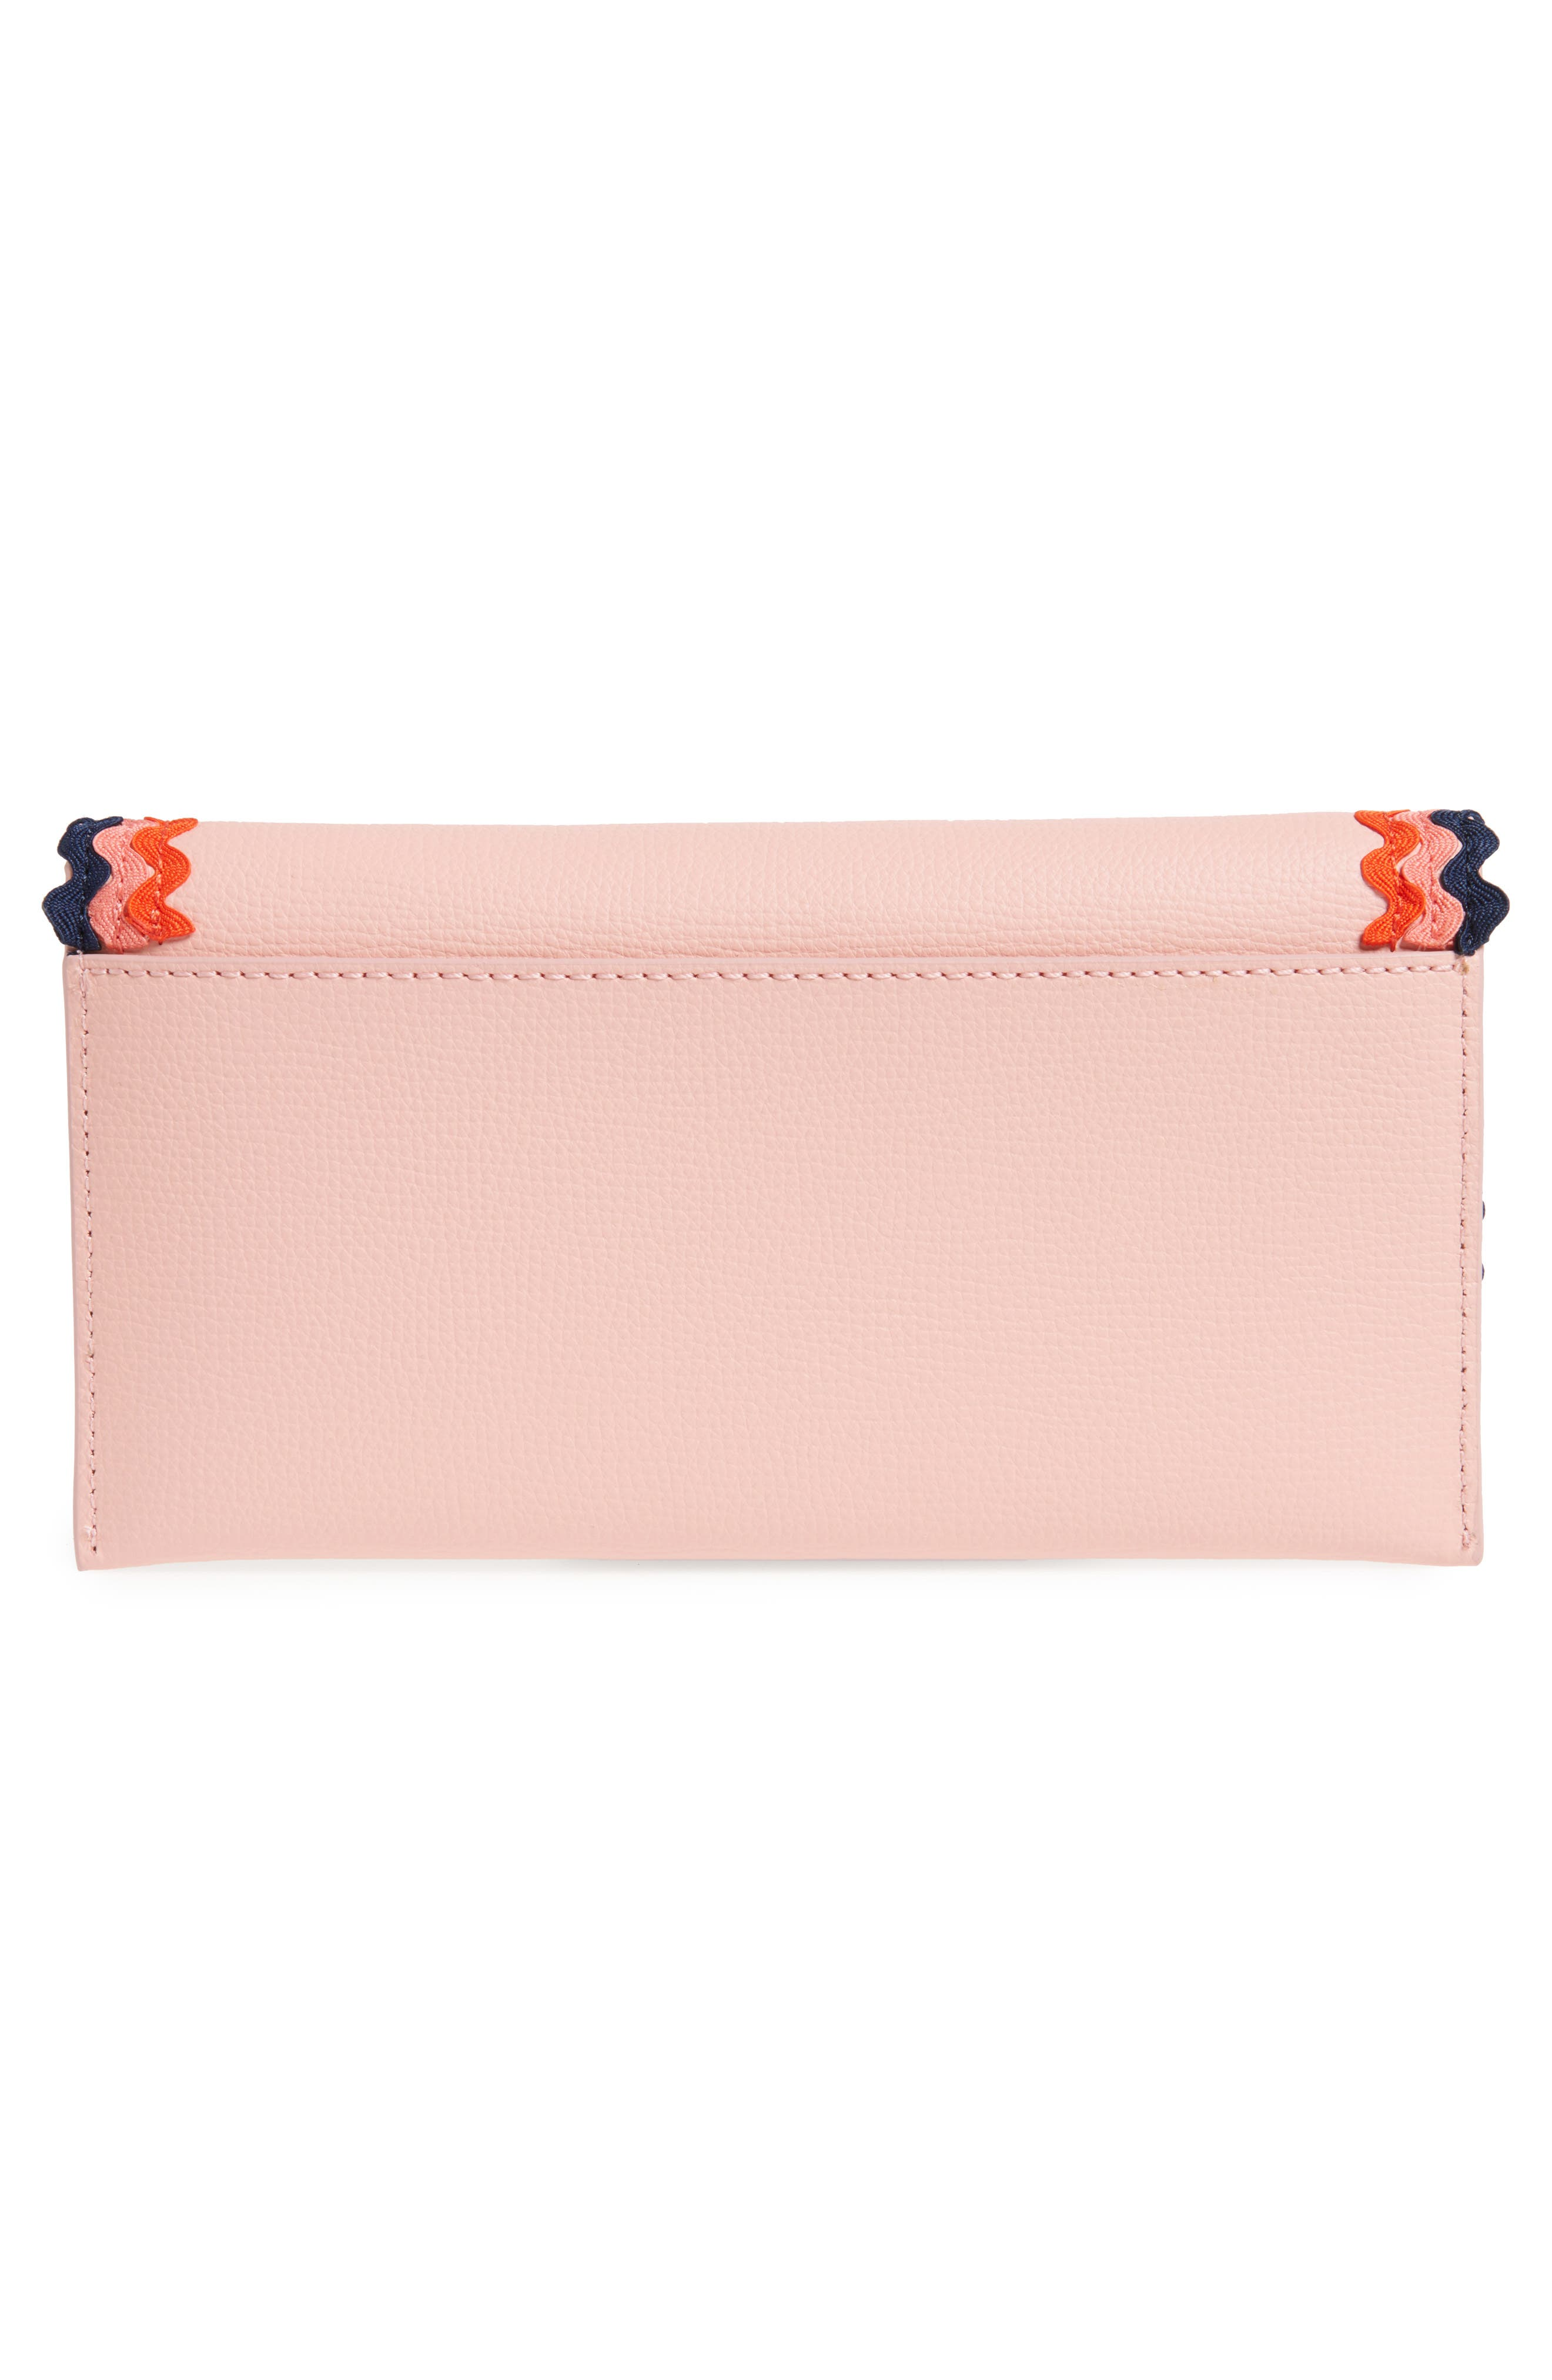 Eveything Embellished Leather Wallet,                             Alternate thumbnail 4, color,                             Ballet/ Multi